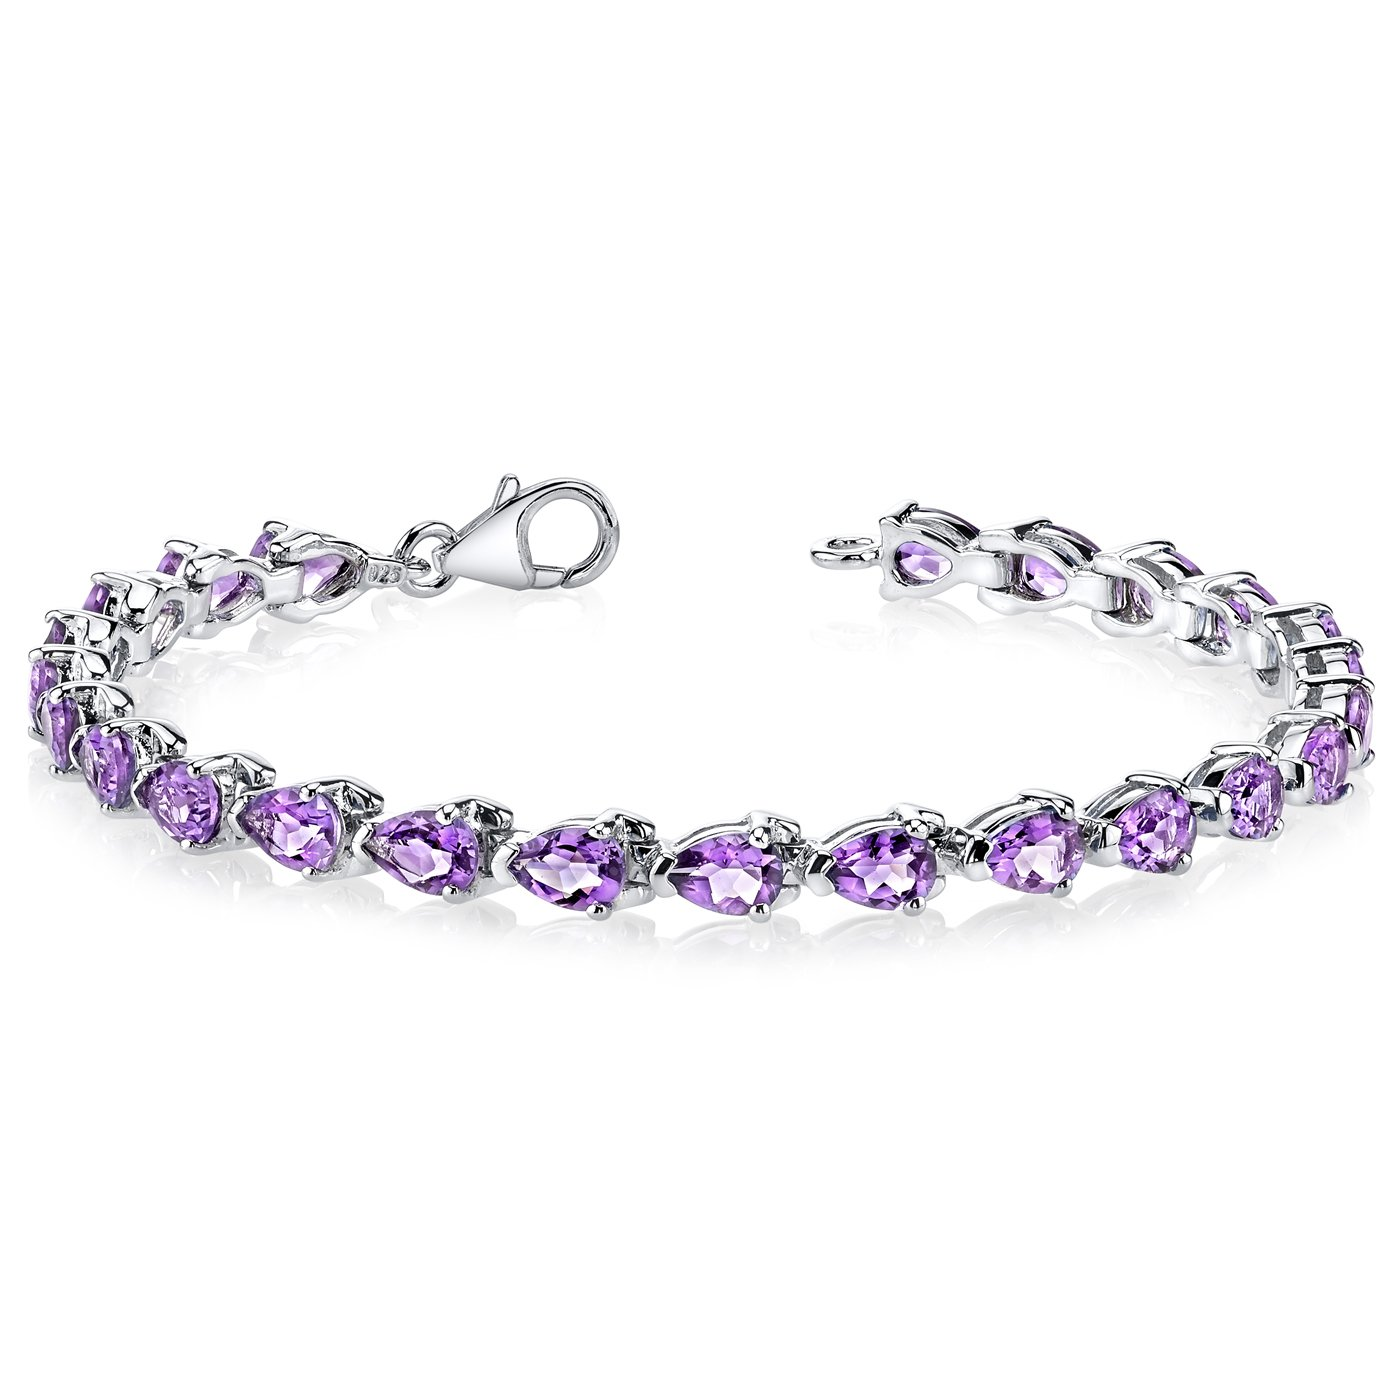 Amethyst Tennis Bracelet Sterling Silver Rhodium Nickel Finish 7.75 Carats Pear Shape